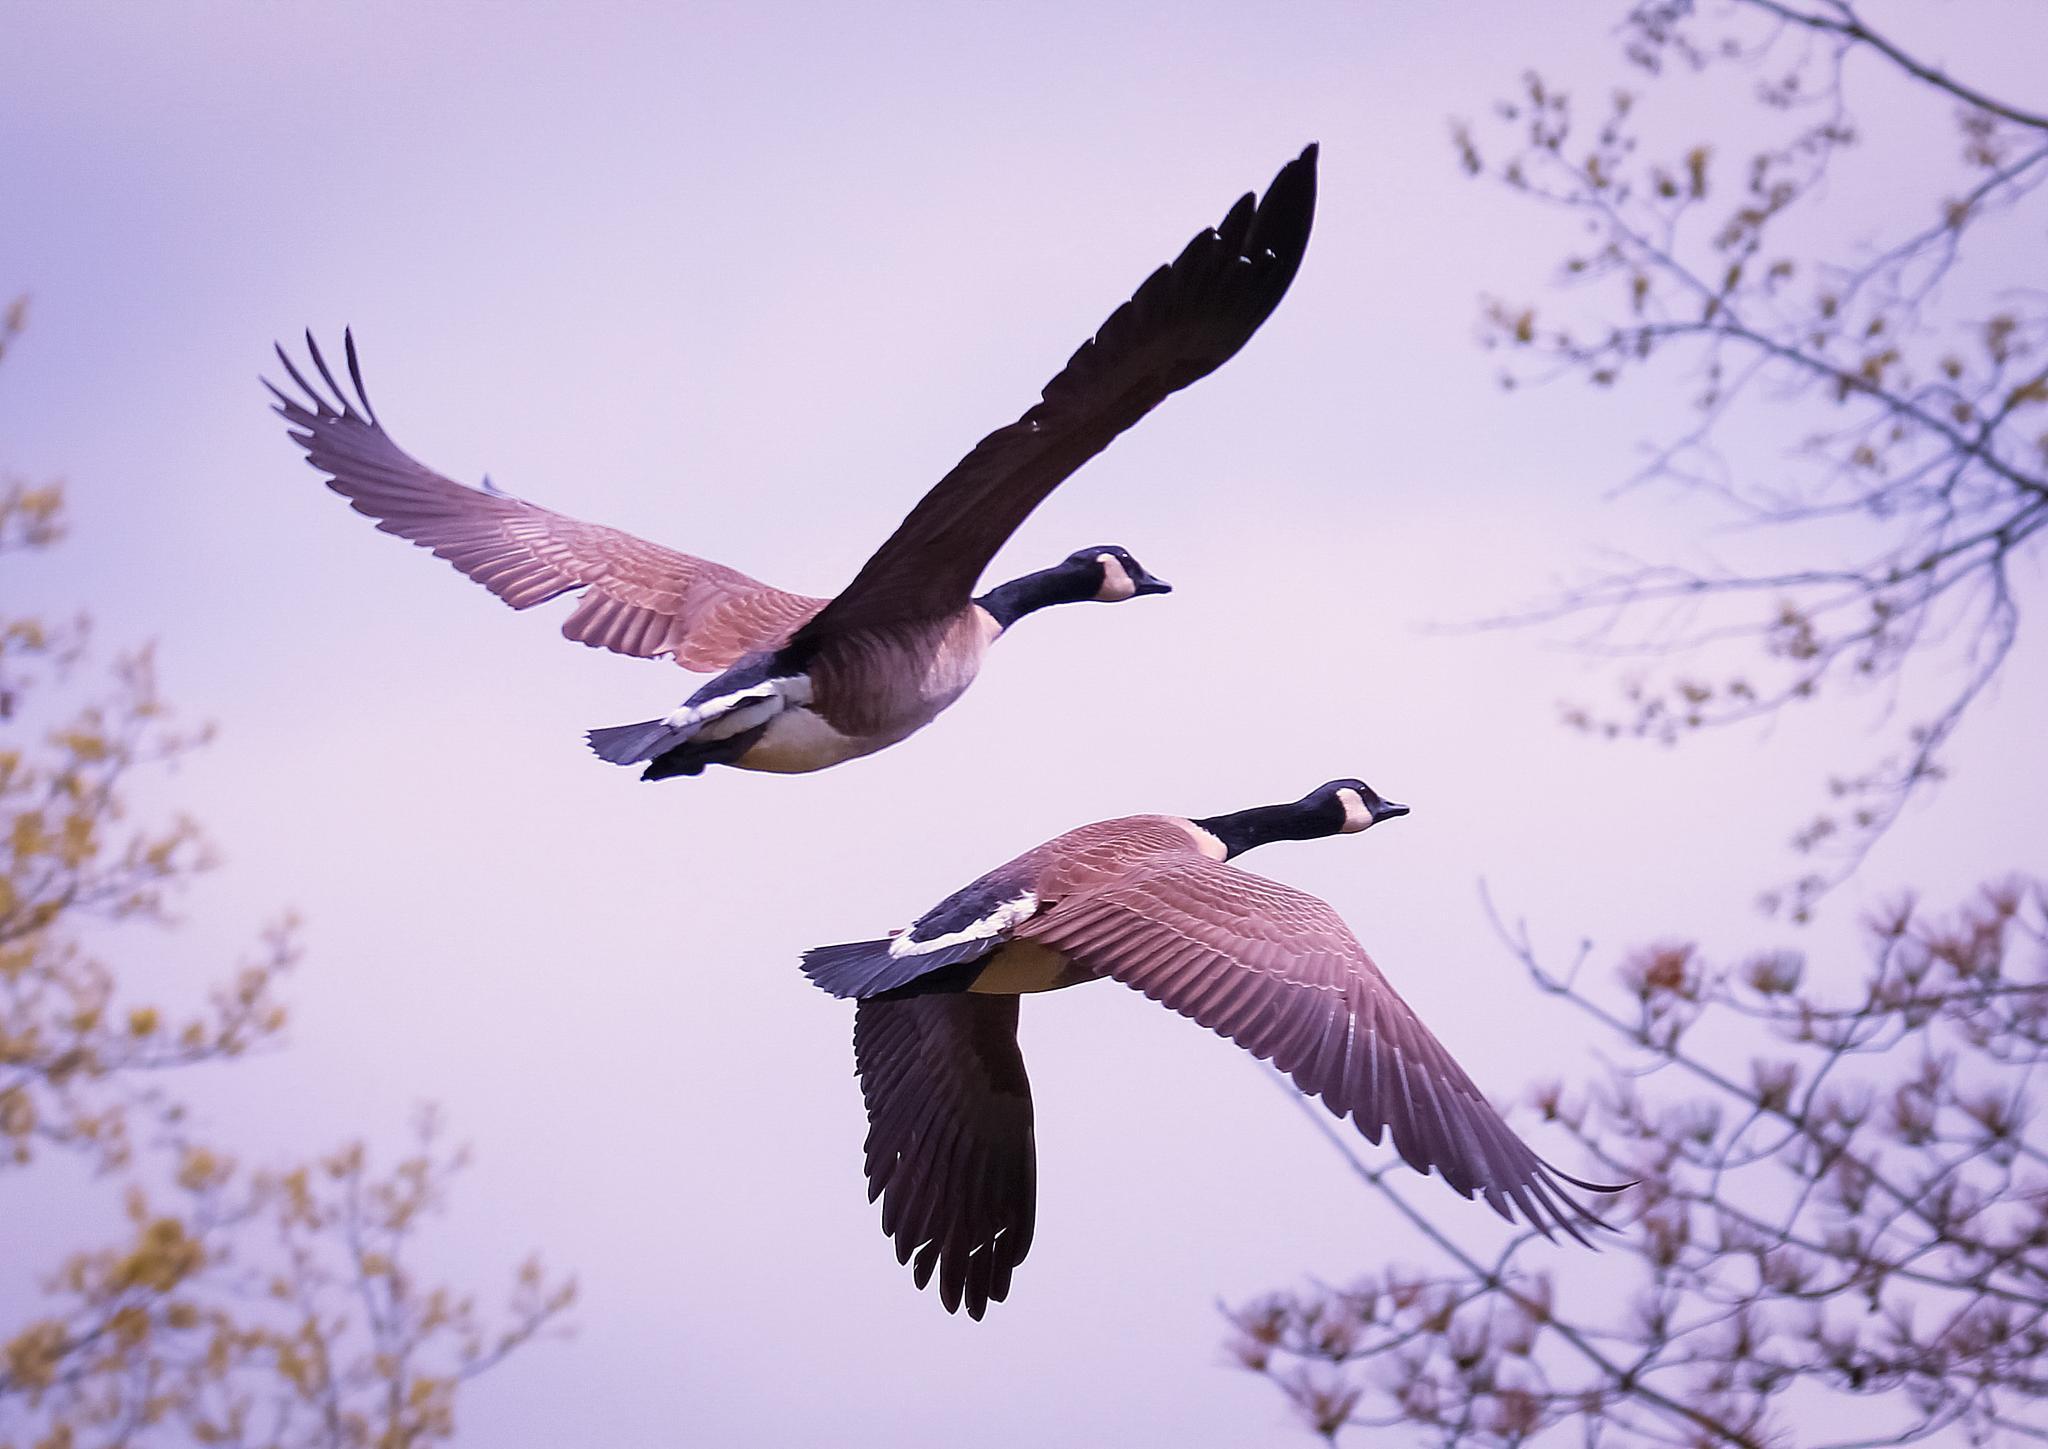 Flying high by Sue Delia